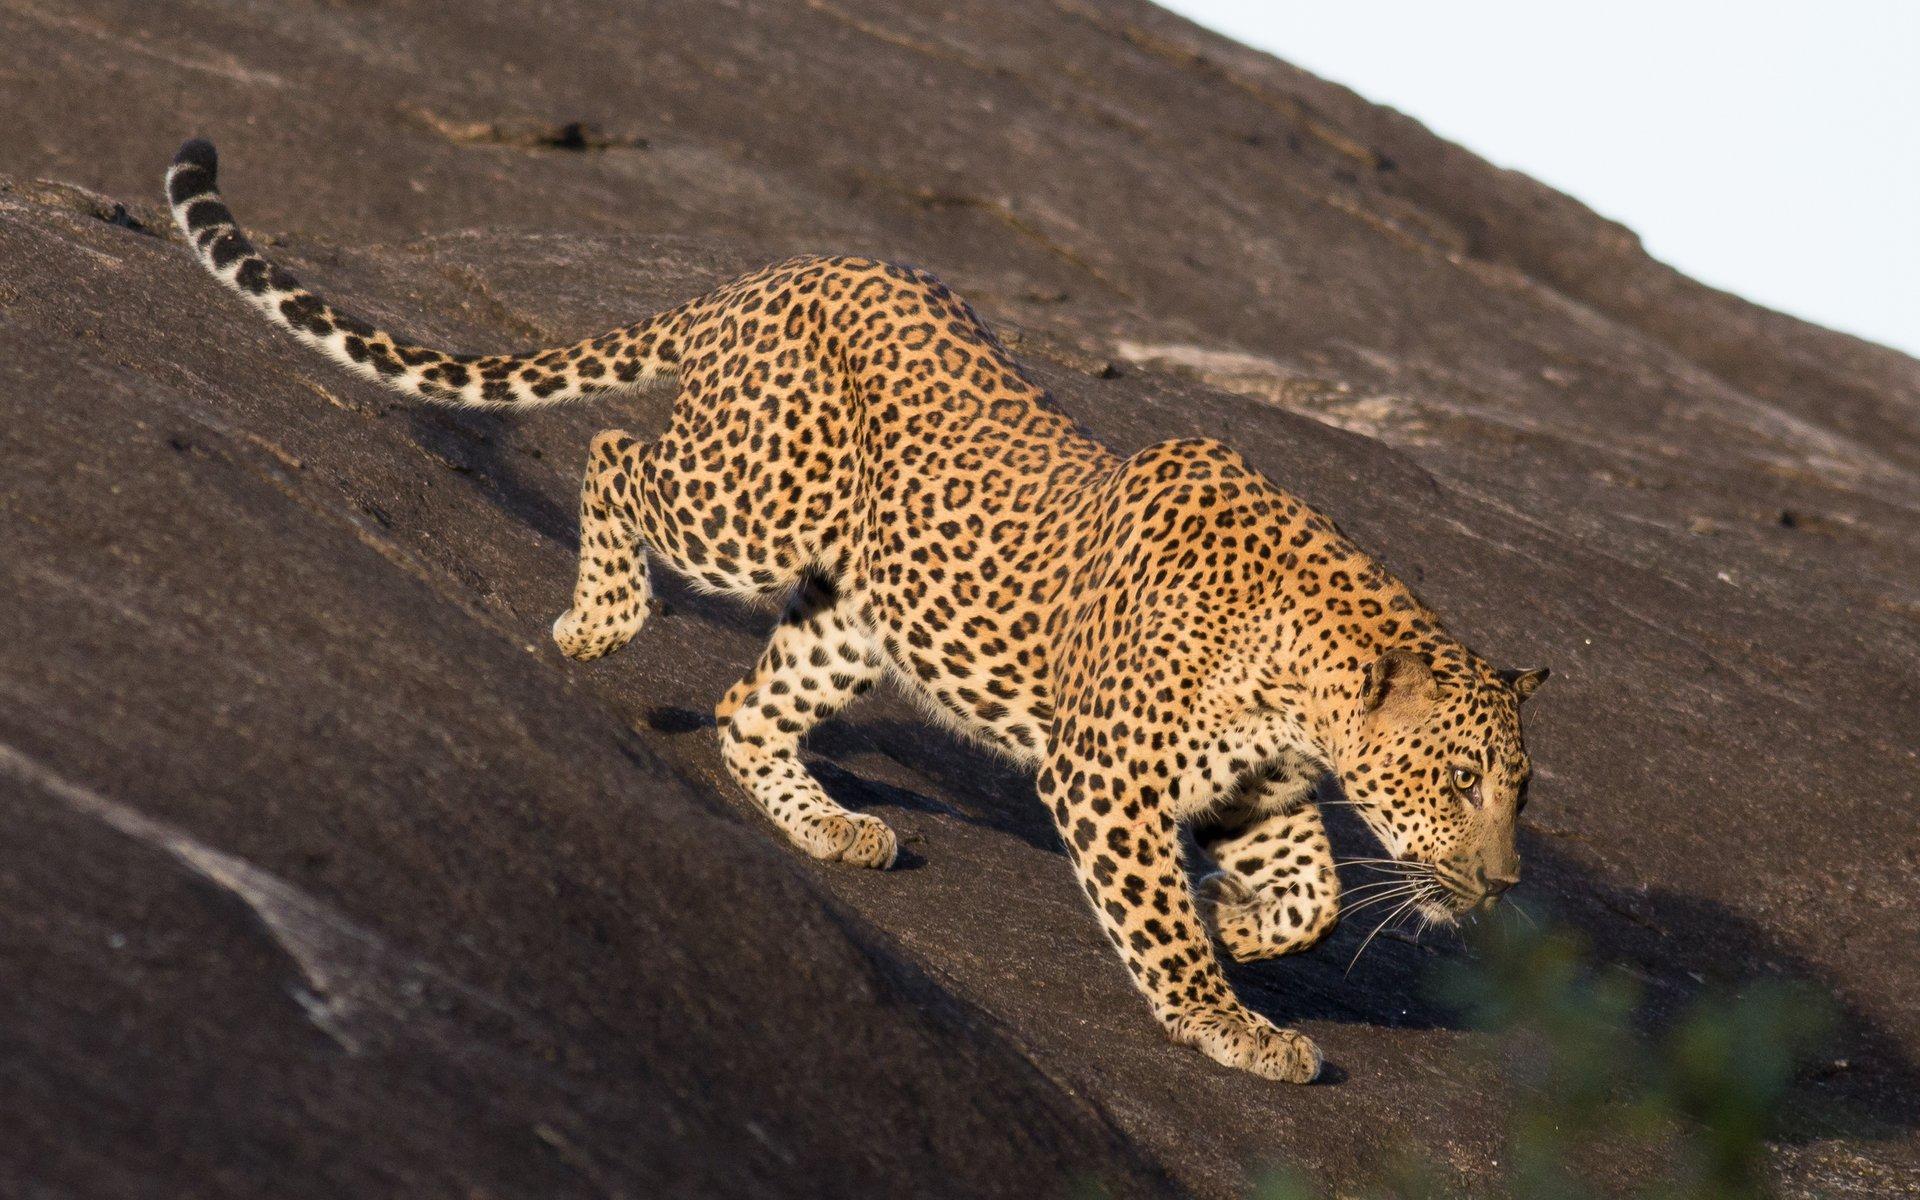 Leopard Safari in Sri Lanka 2019 - Best Time